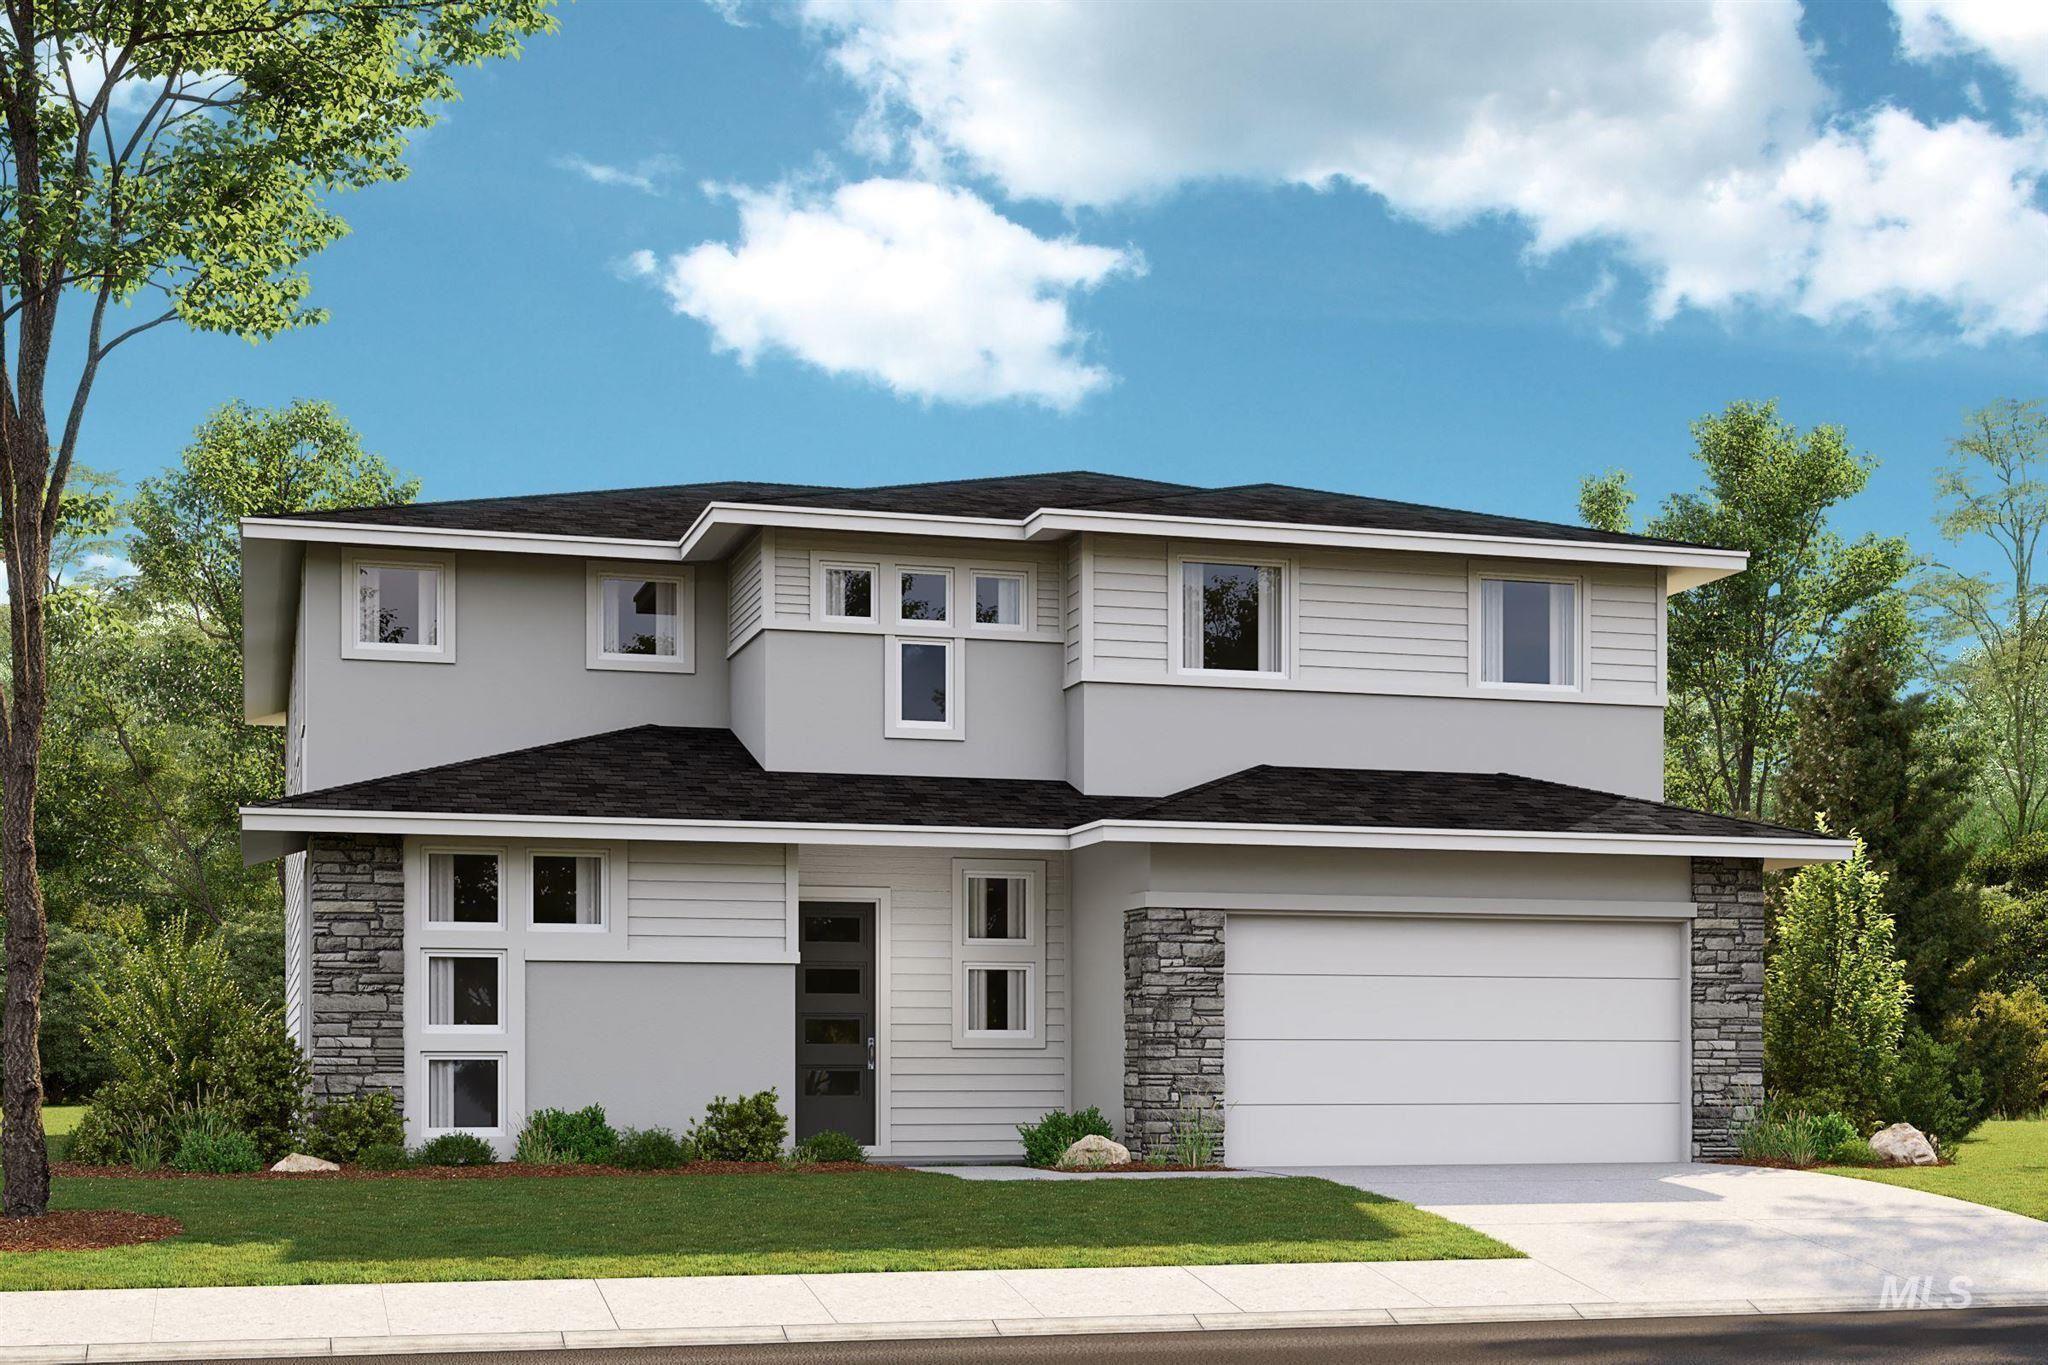 5589 S Zaivcla Ave. Property Photo